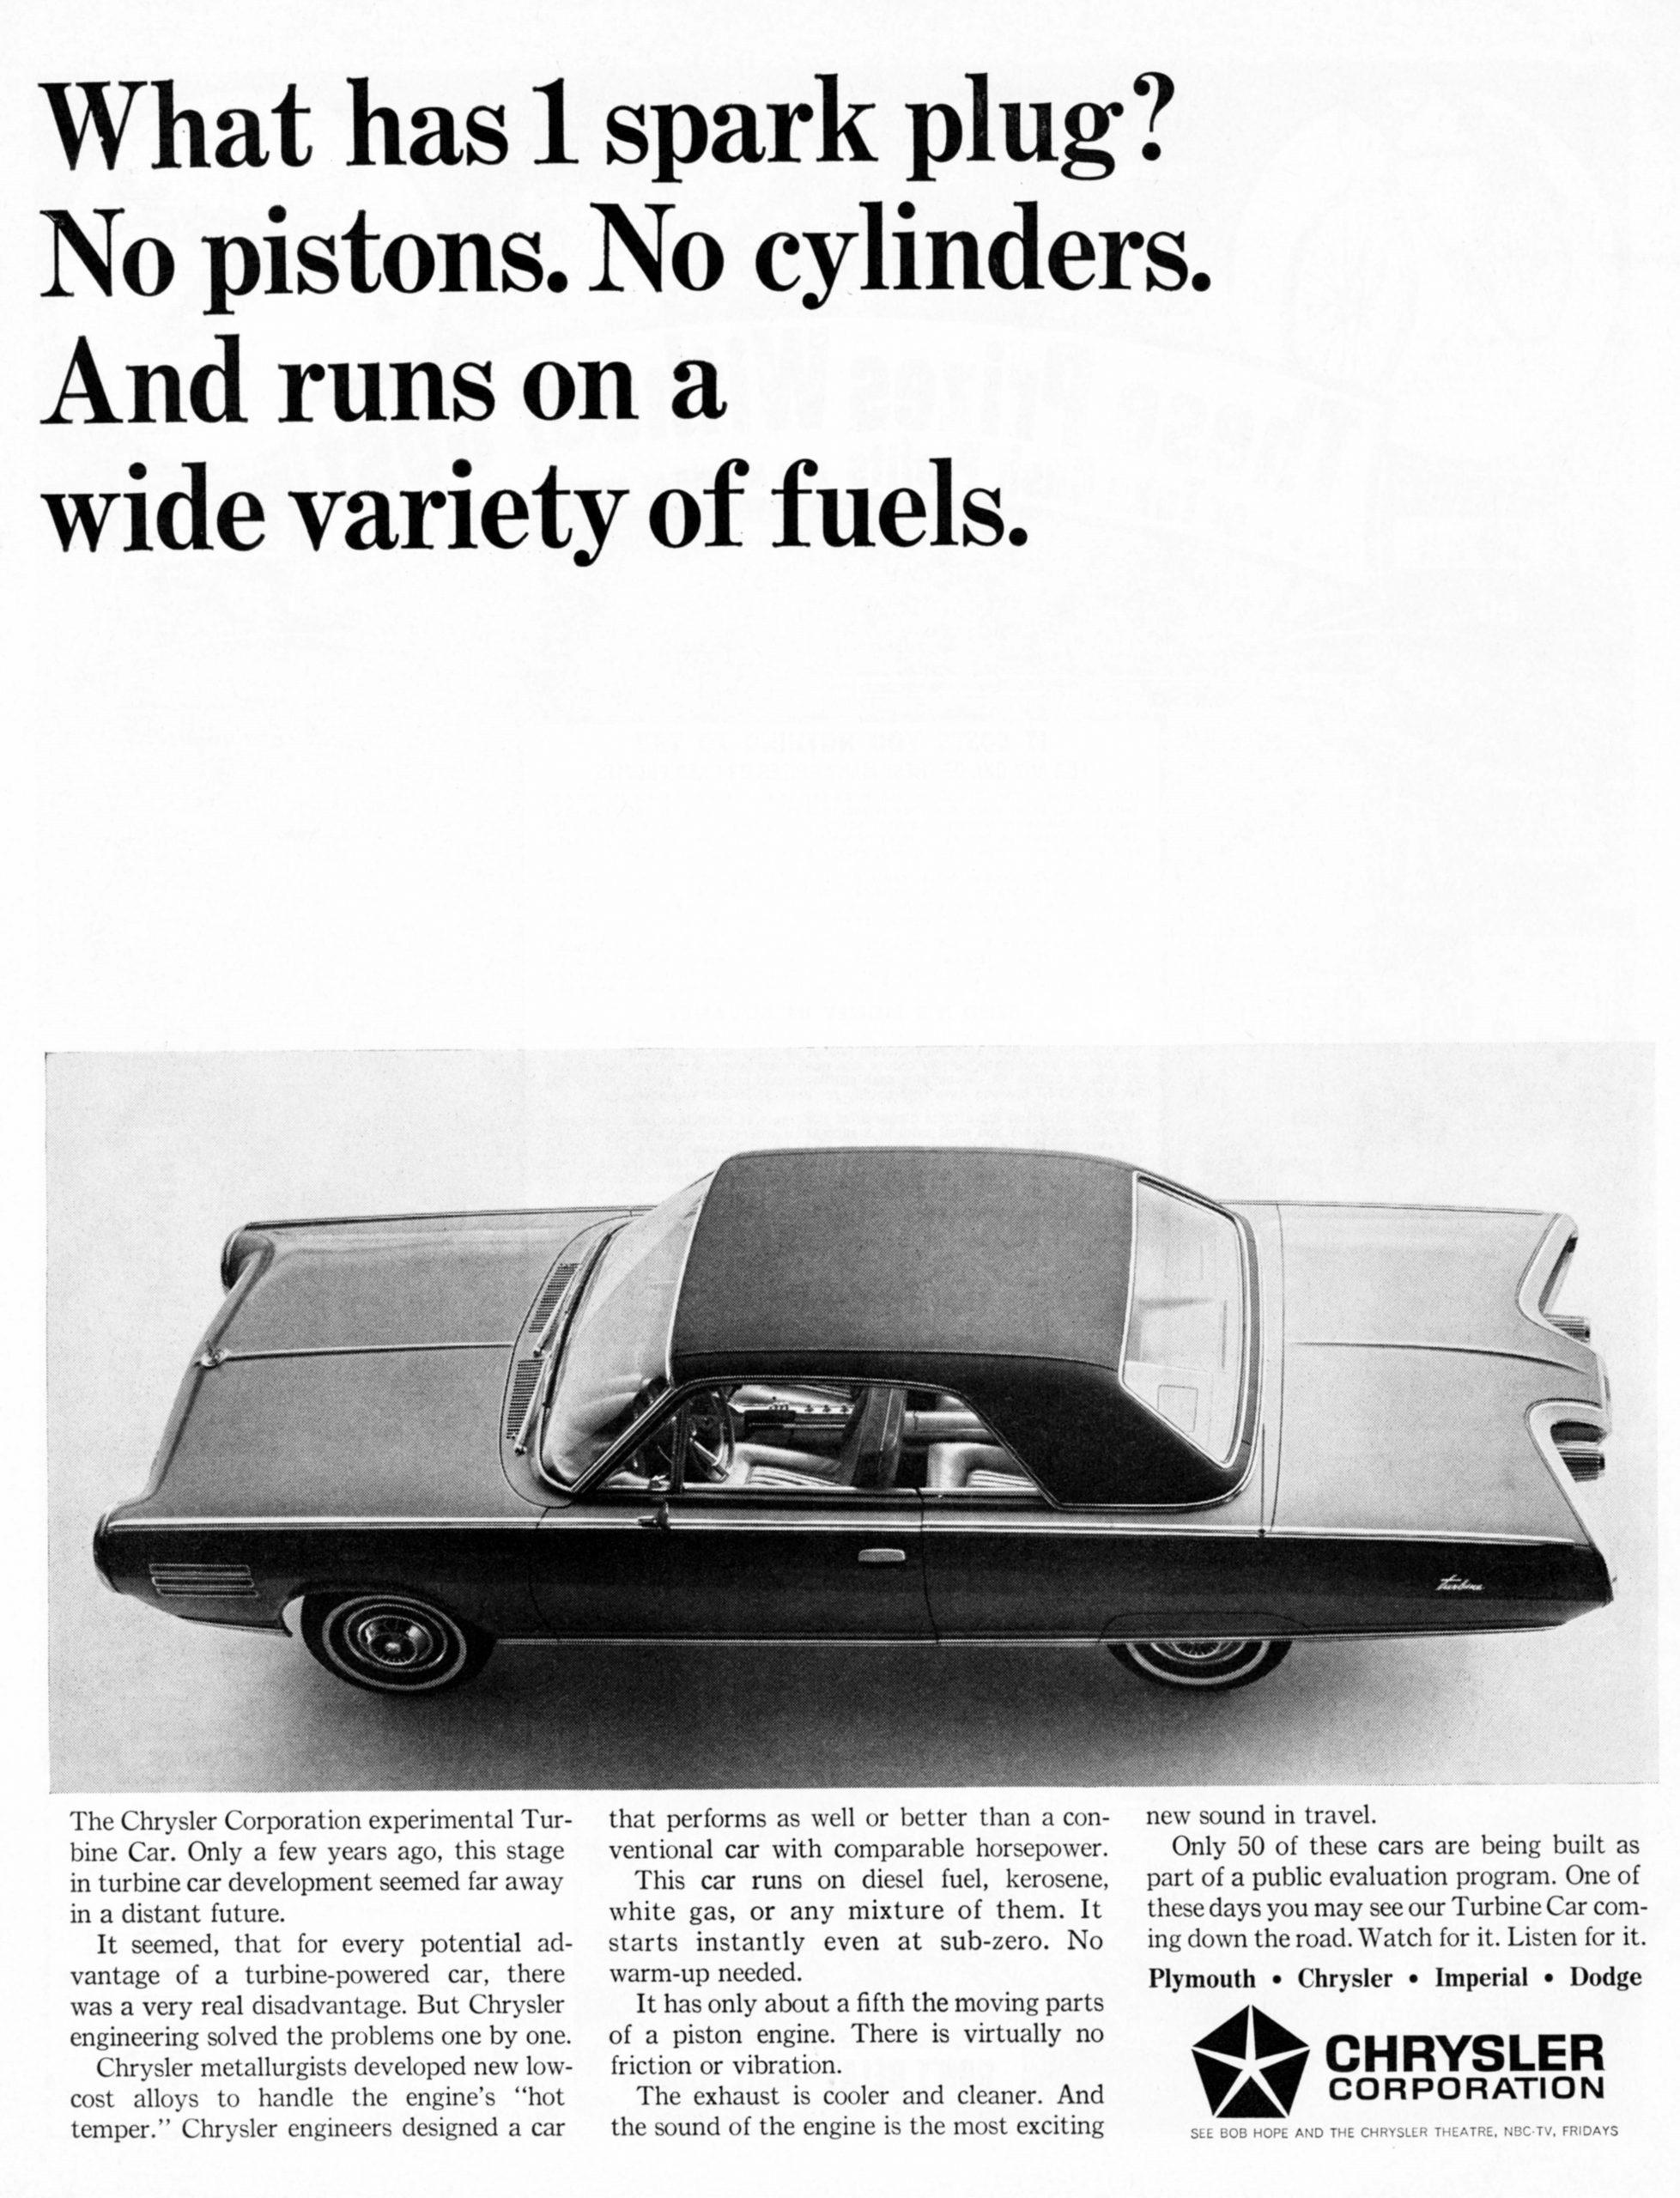 Chrysler Turbine history - 1964 Chrysler Turbine Ad